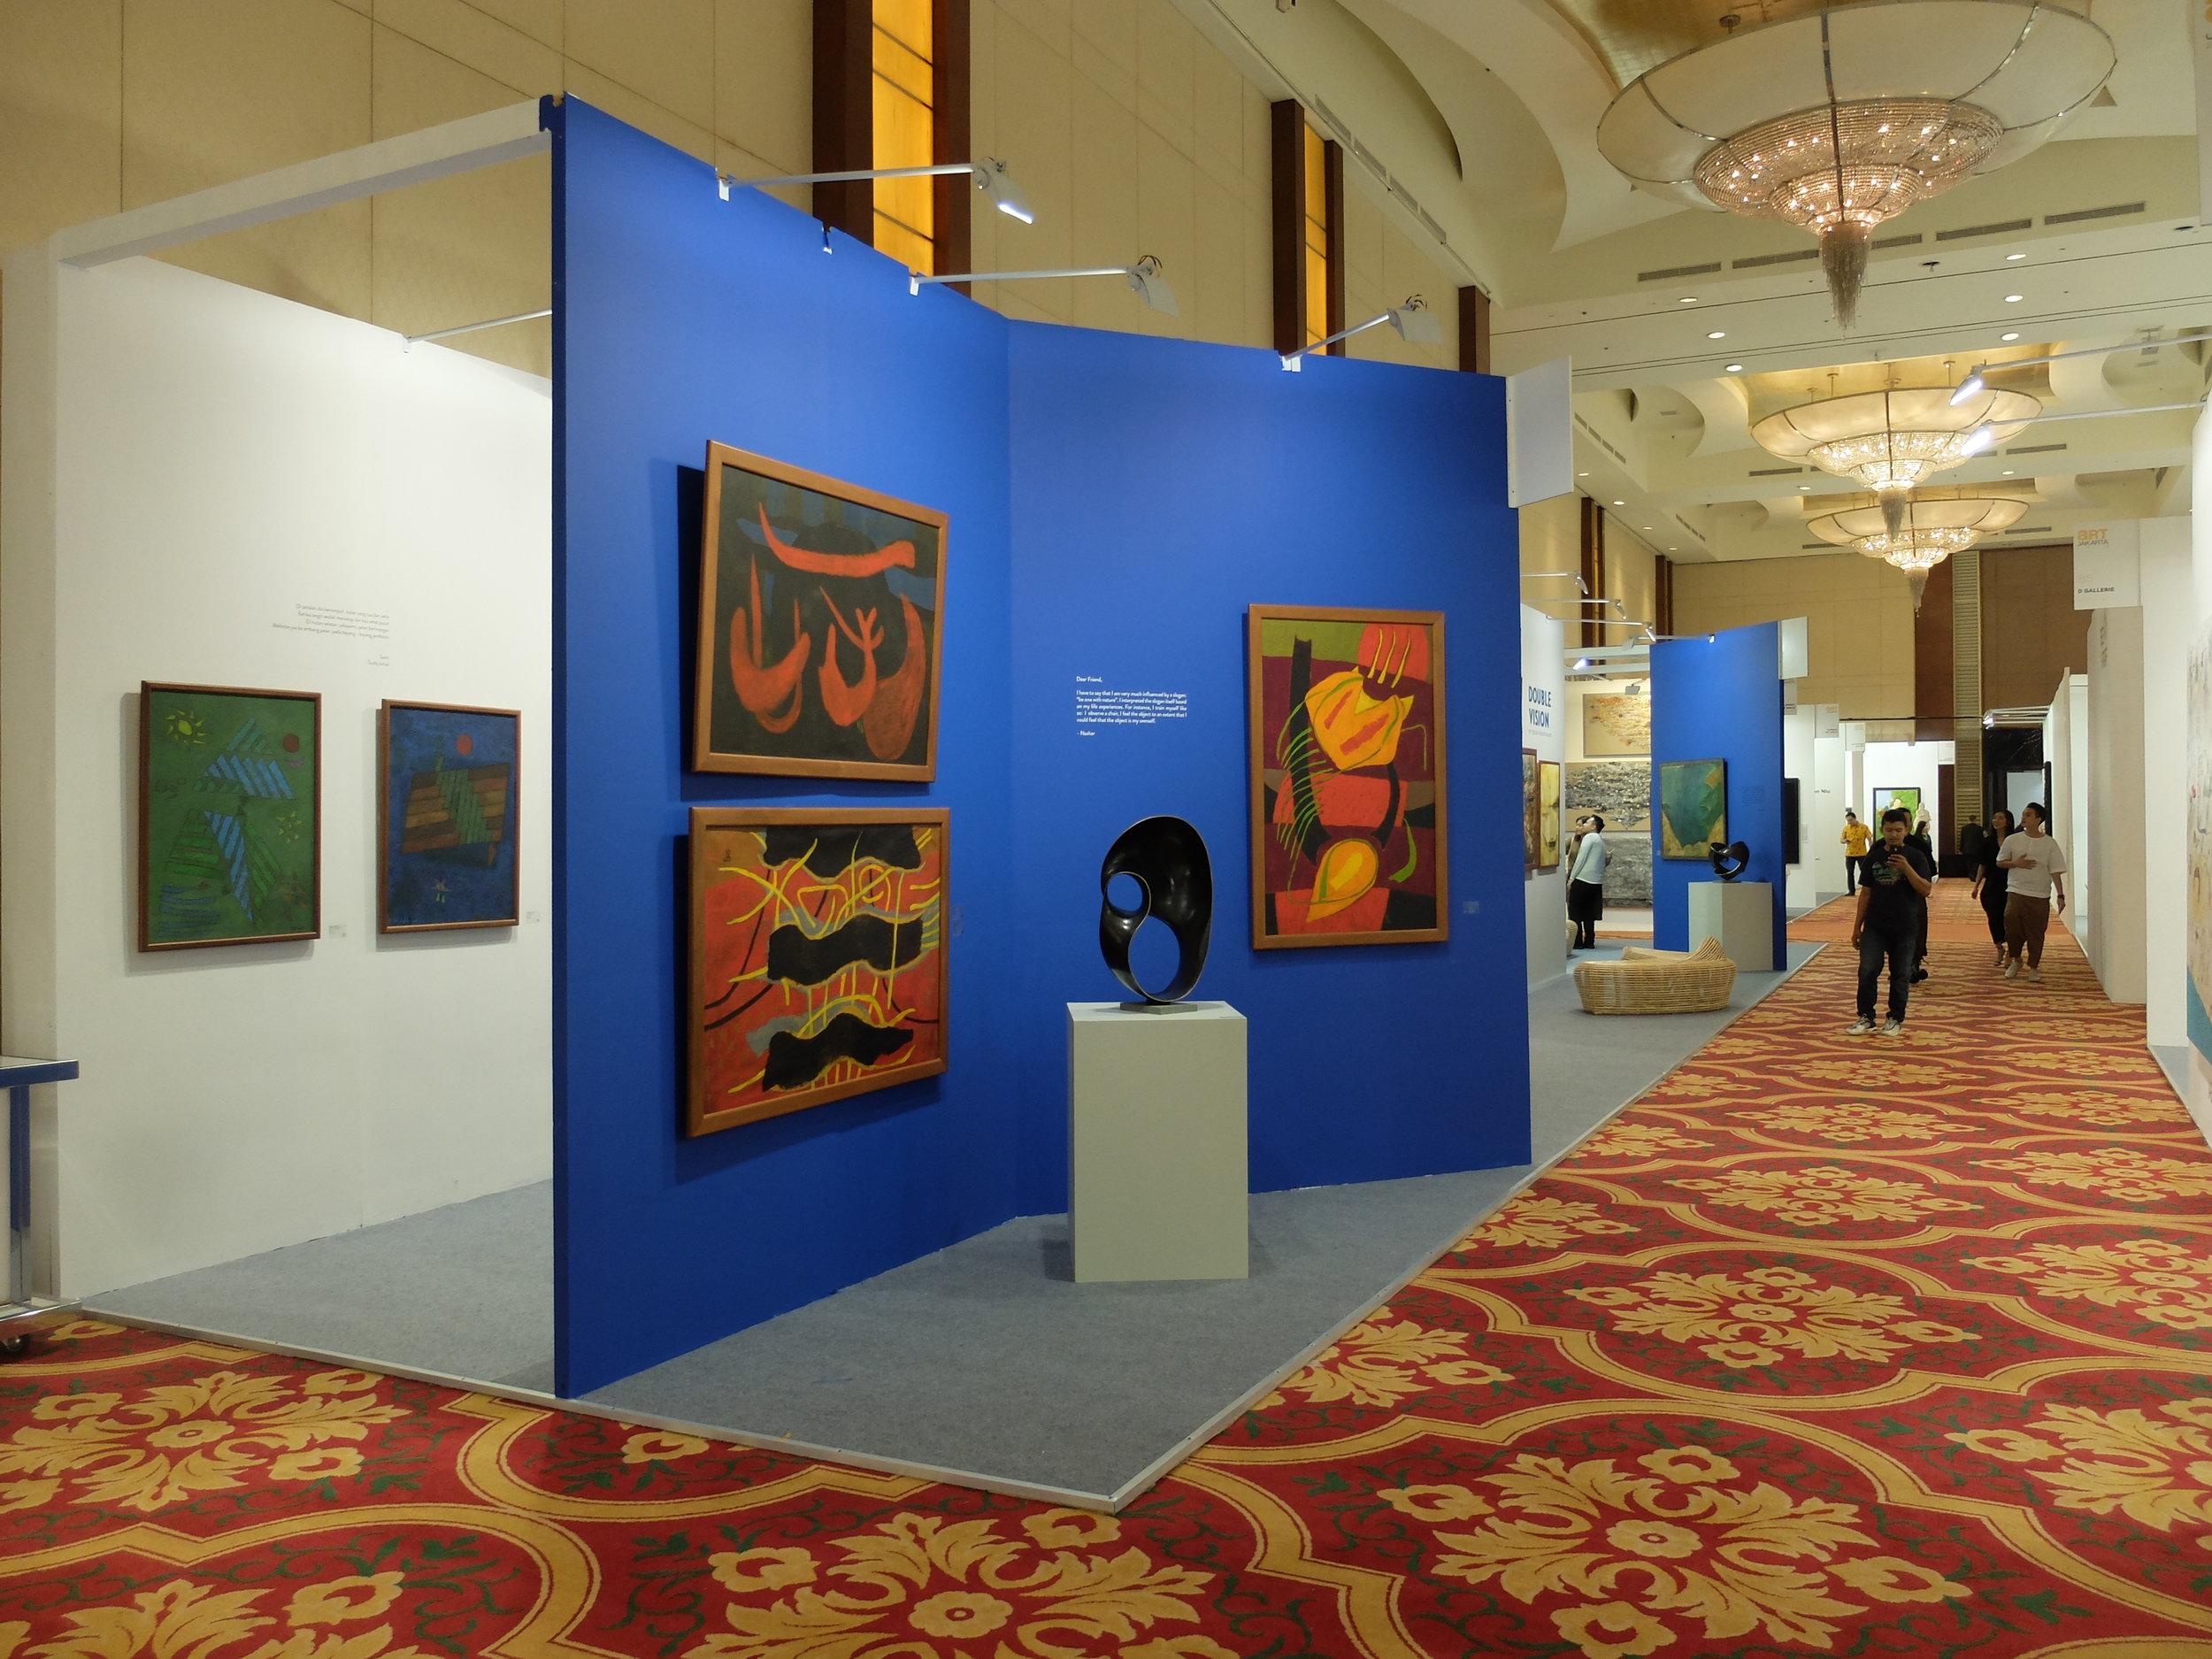 Art Agenda, S.E.A.'s booth at Art Jakarta 2018, featuring Nashar and Ahmad Osni Peii